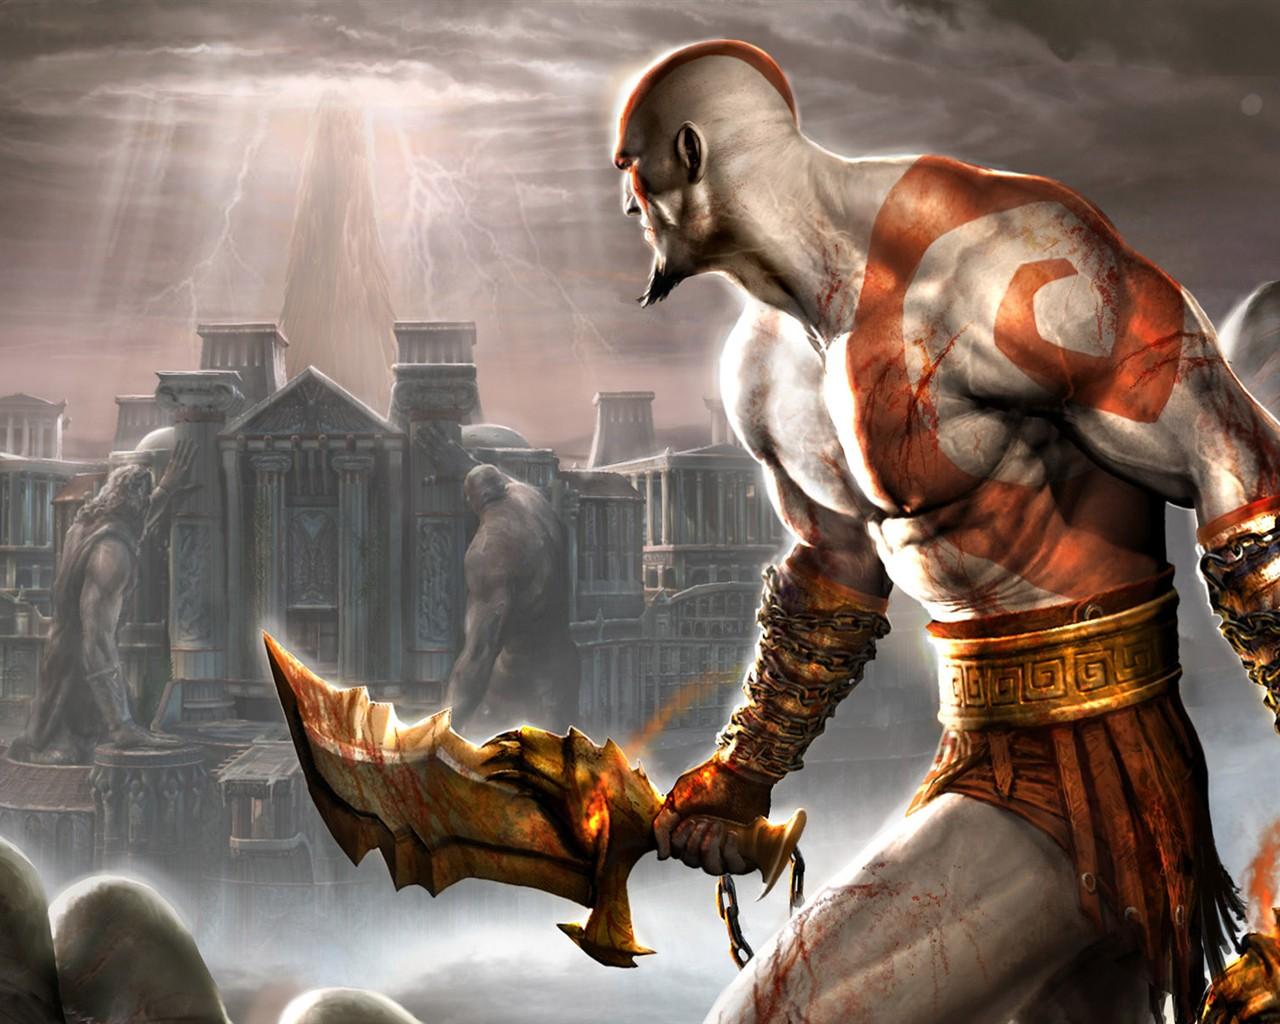 God Of War Hd Wallpaper 14 1280x1024 Wallpaper Download